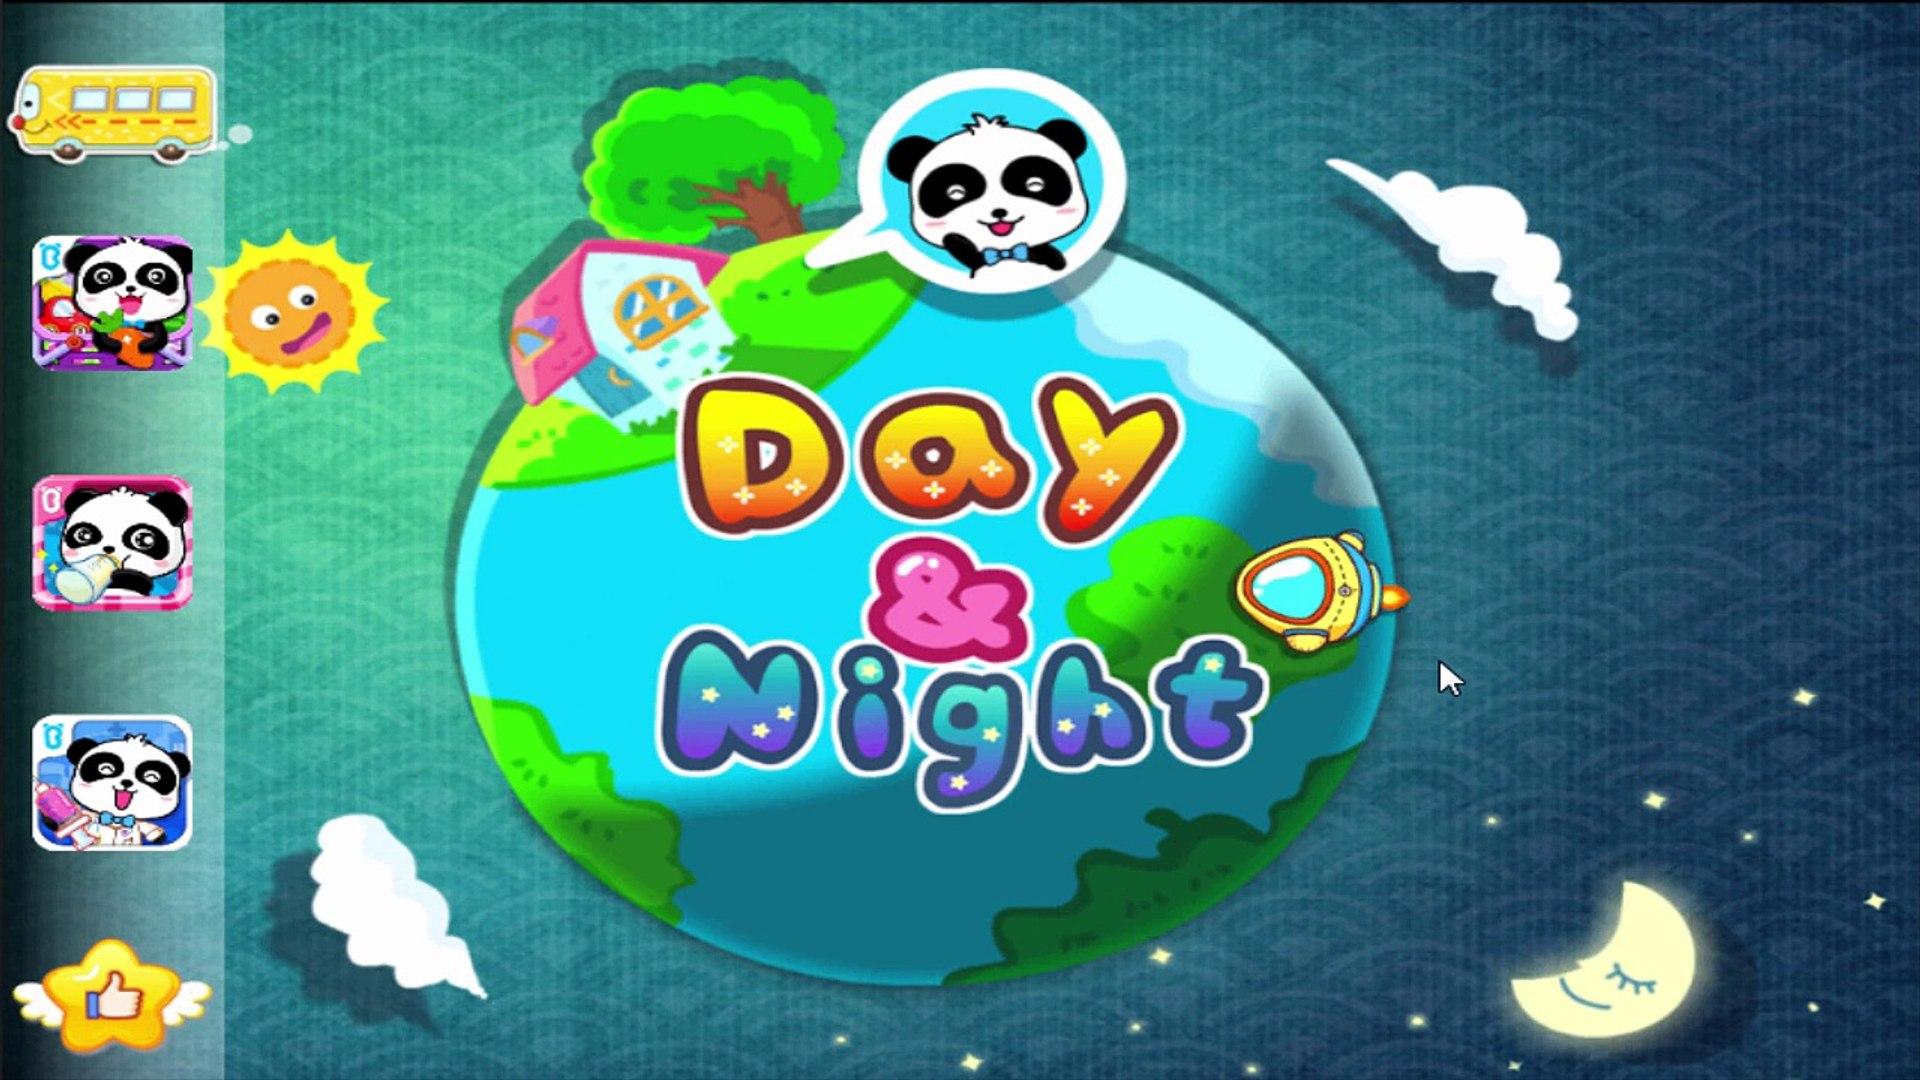 Baby Panda What Baby Daily Do | Baby Learn Fun Daily Routine | BabyBus Educational Kids Ga